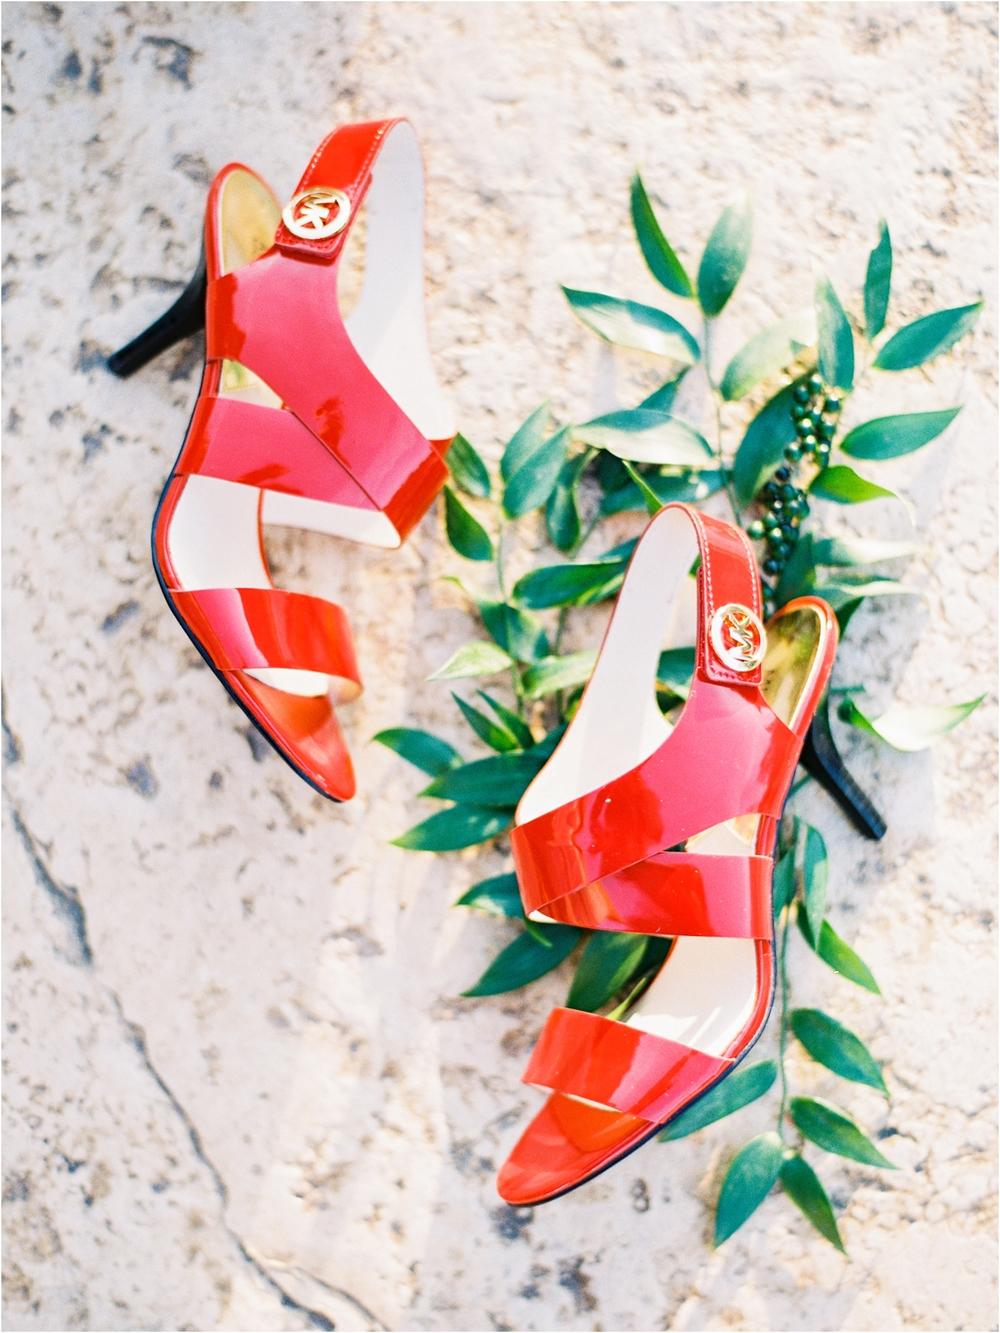 Springfield MO Wedding Ideas - Jordan Brittley Photography (www.jordanbrittley.com) // Michael Kors Shoes